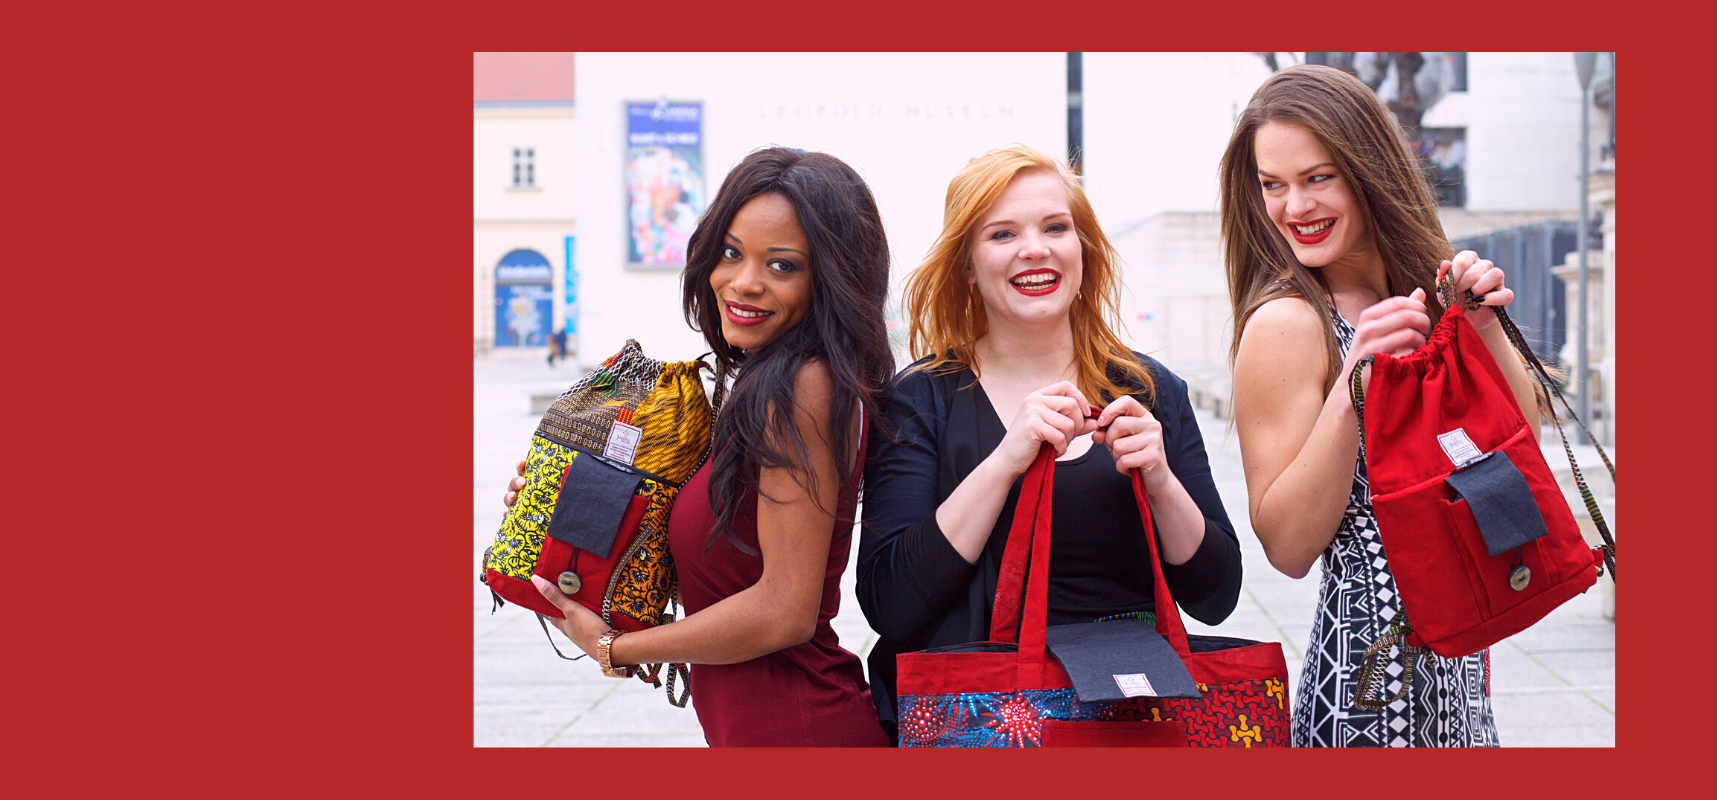 Nachhaltige Mode afrikanisch inspiriert Joadre online store